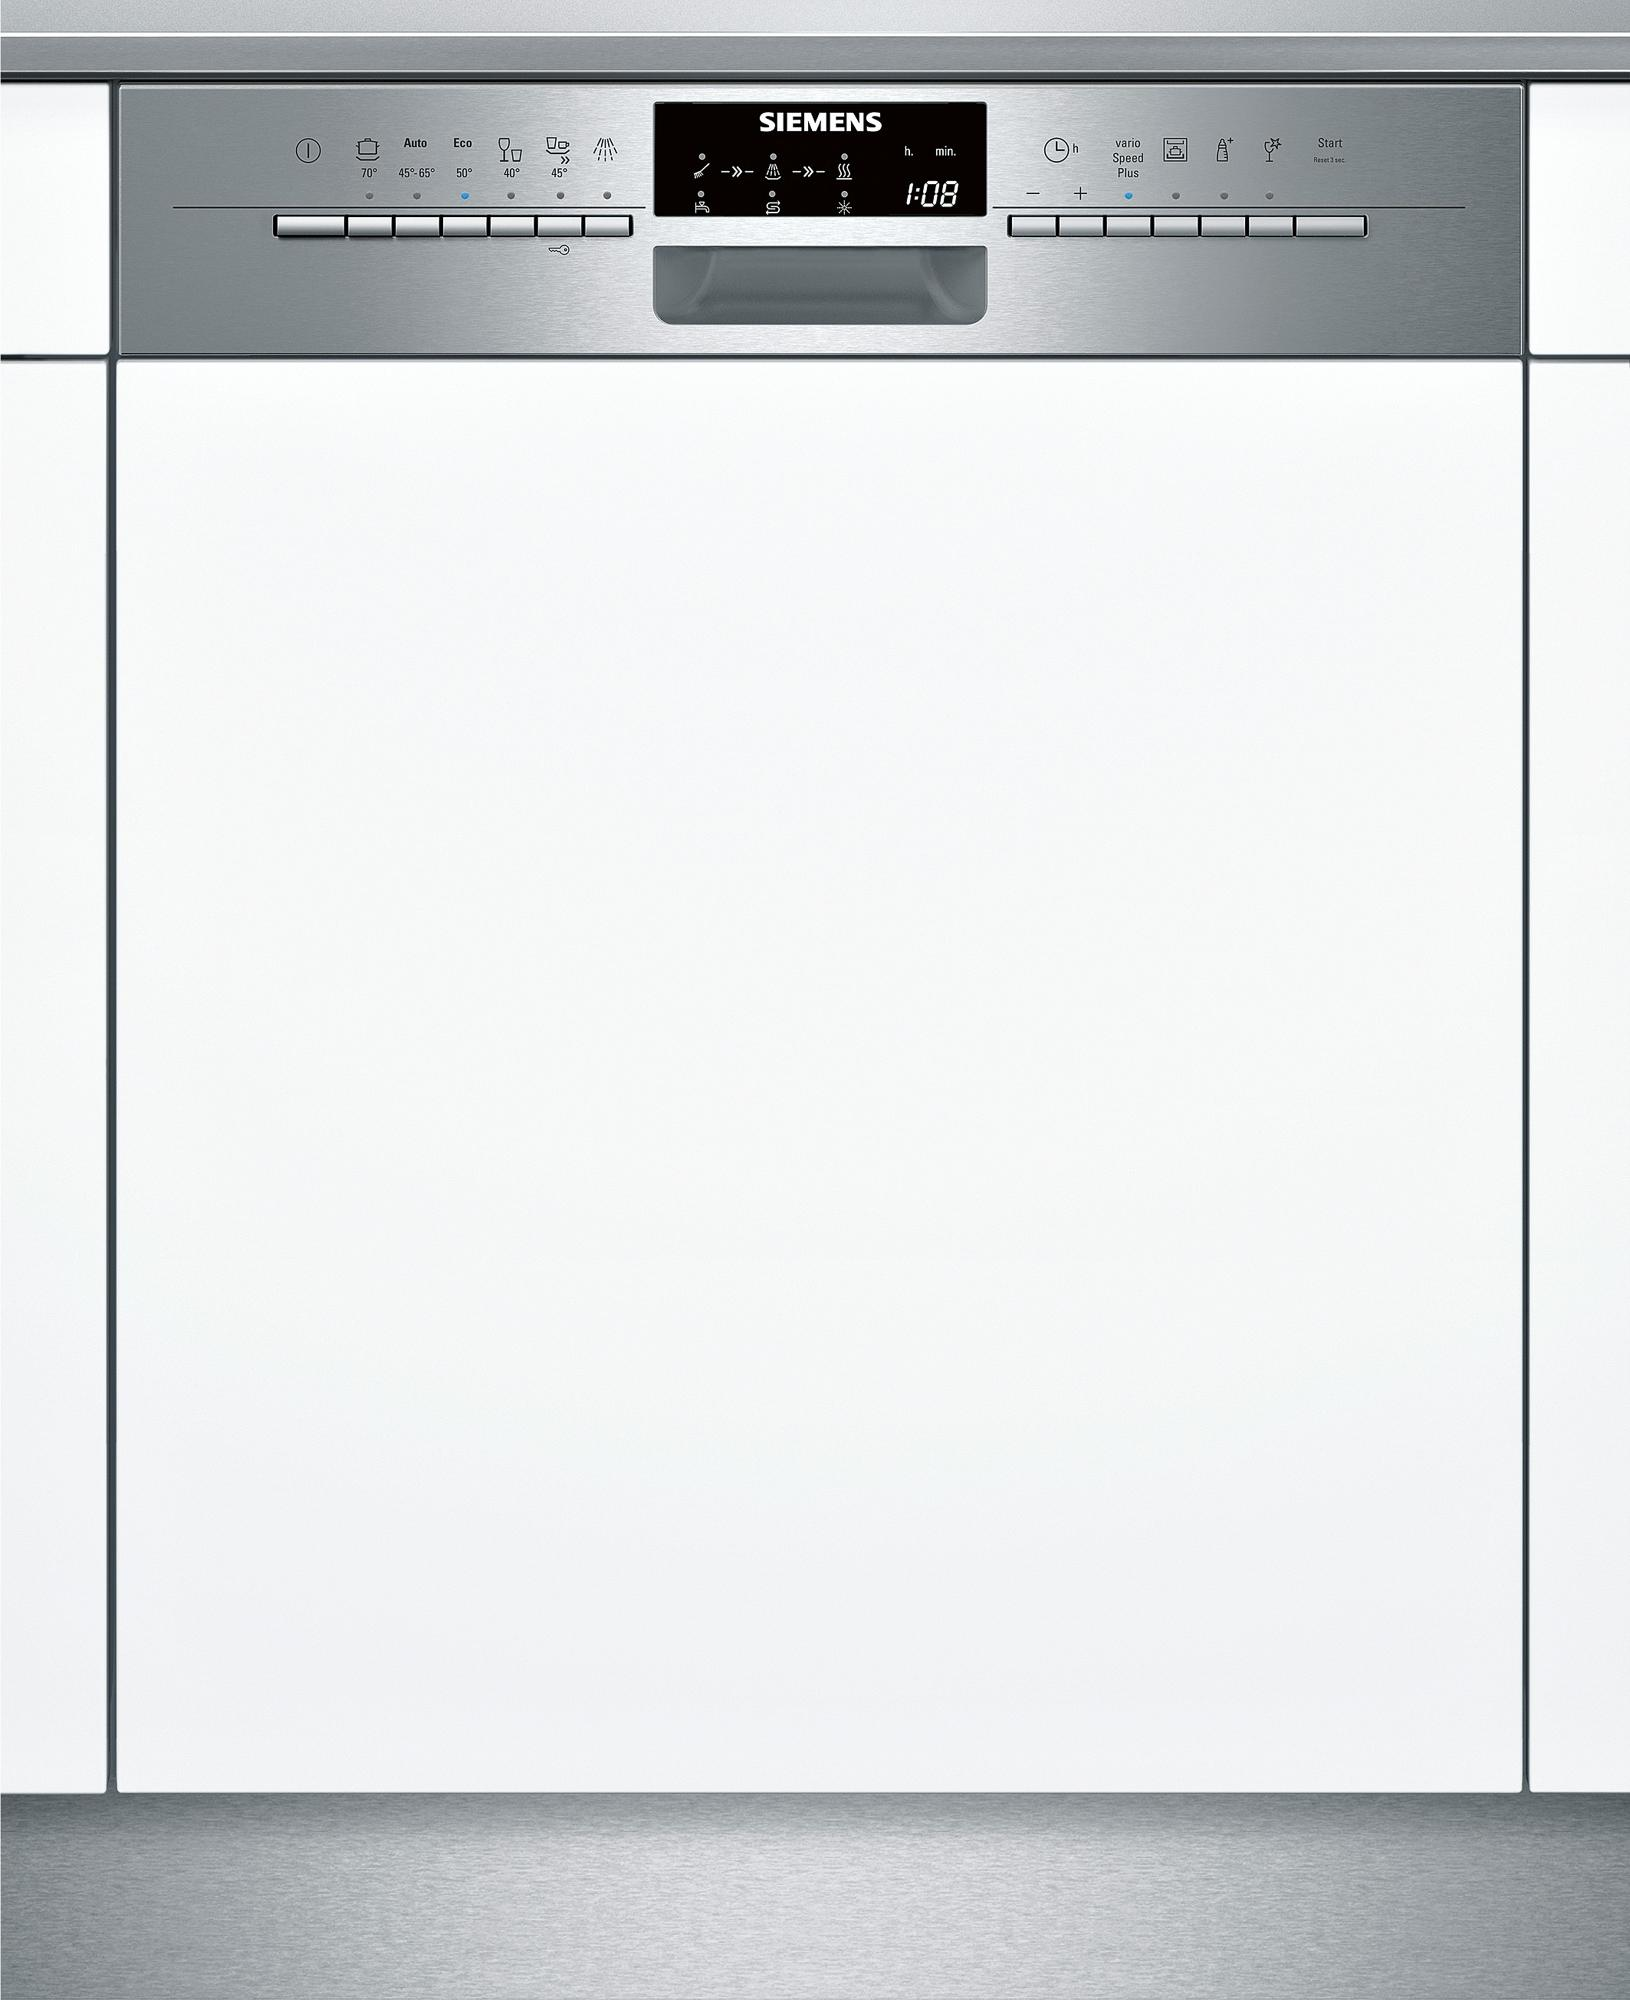 siemens sn56p592eu a integrierbarer geschirrsp ler 60 cm breit edelstahl 14 ma gedecke. Black Bedroom Furniture Sets. Home Design Ideas